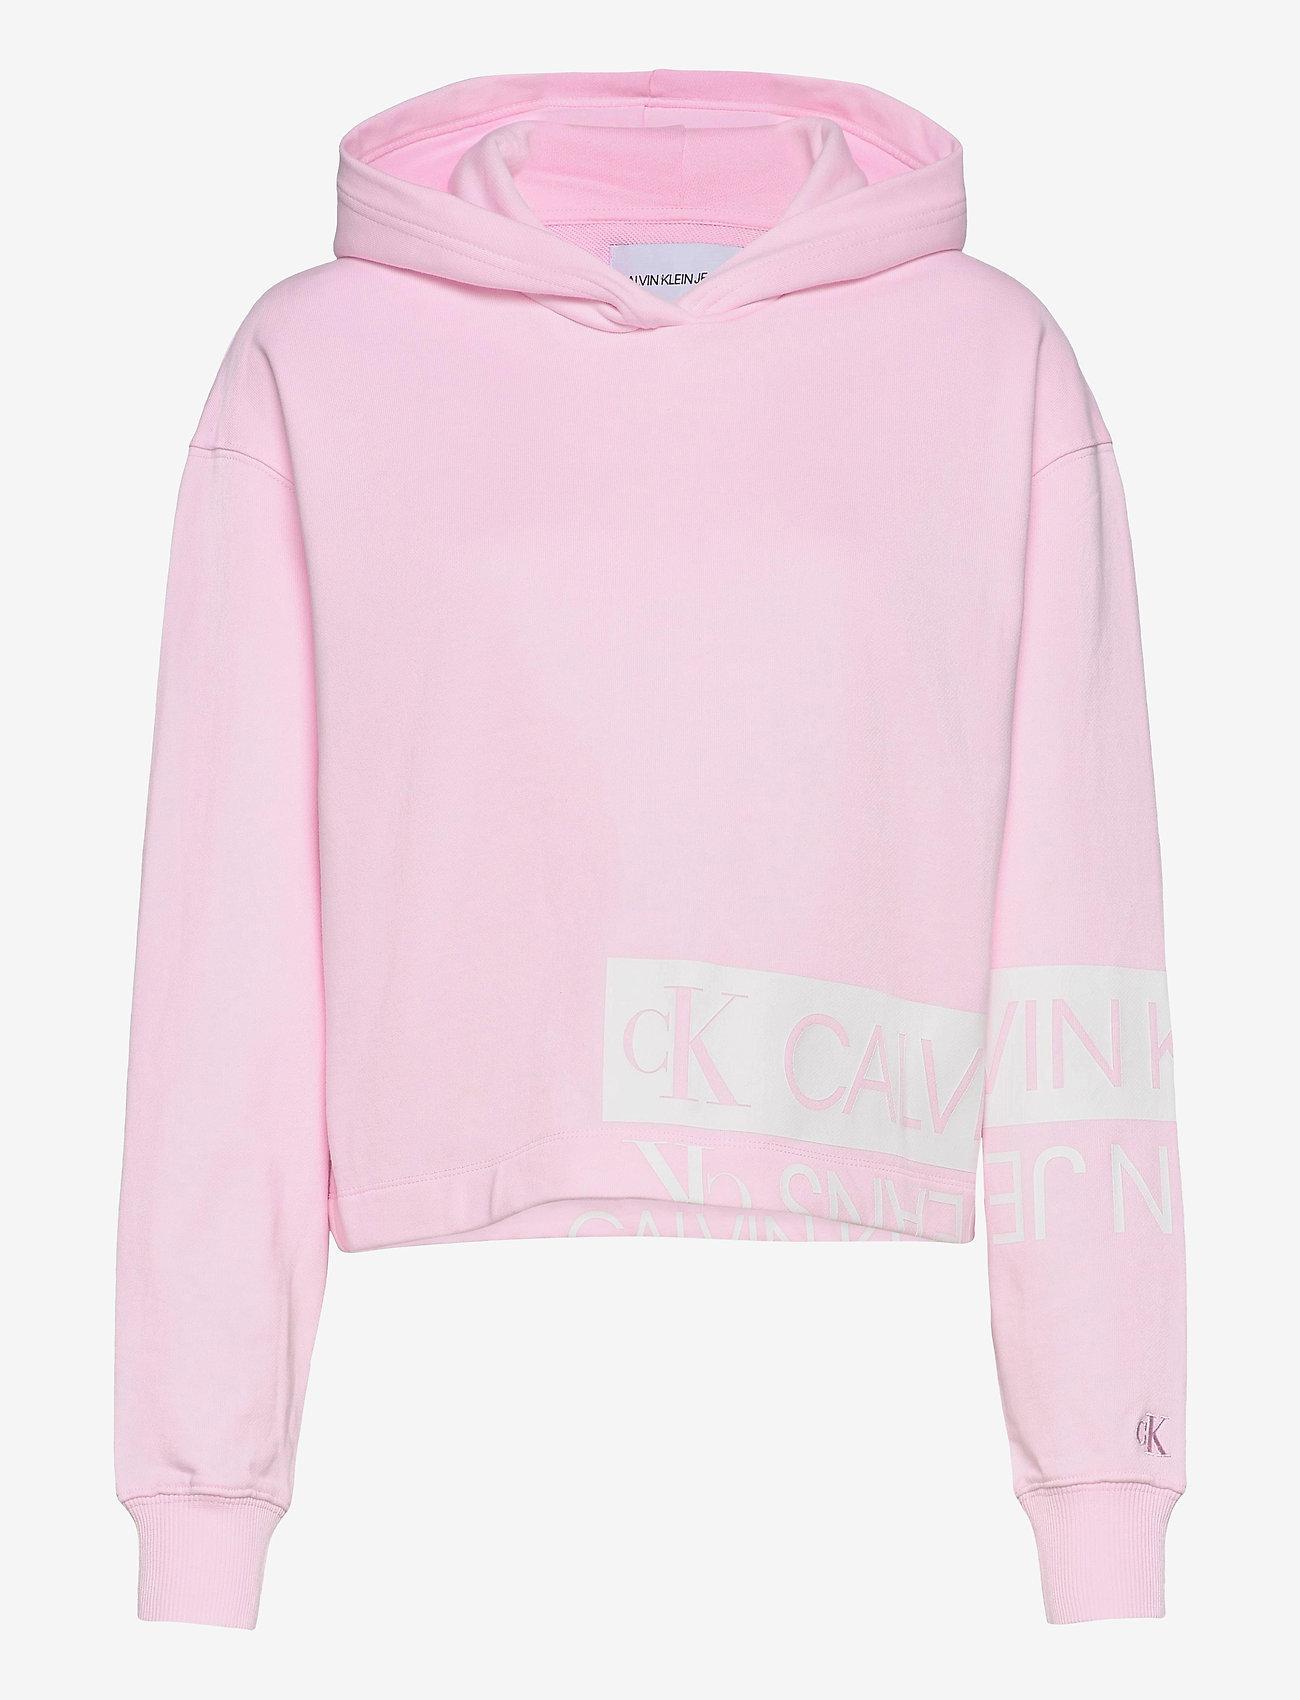 Calvin Klein Jeans - MIRRORED LOGO HOODIE - gensere og hettegensere - pearly pink / bright white - 0